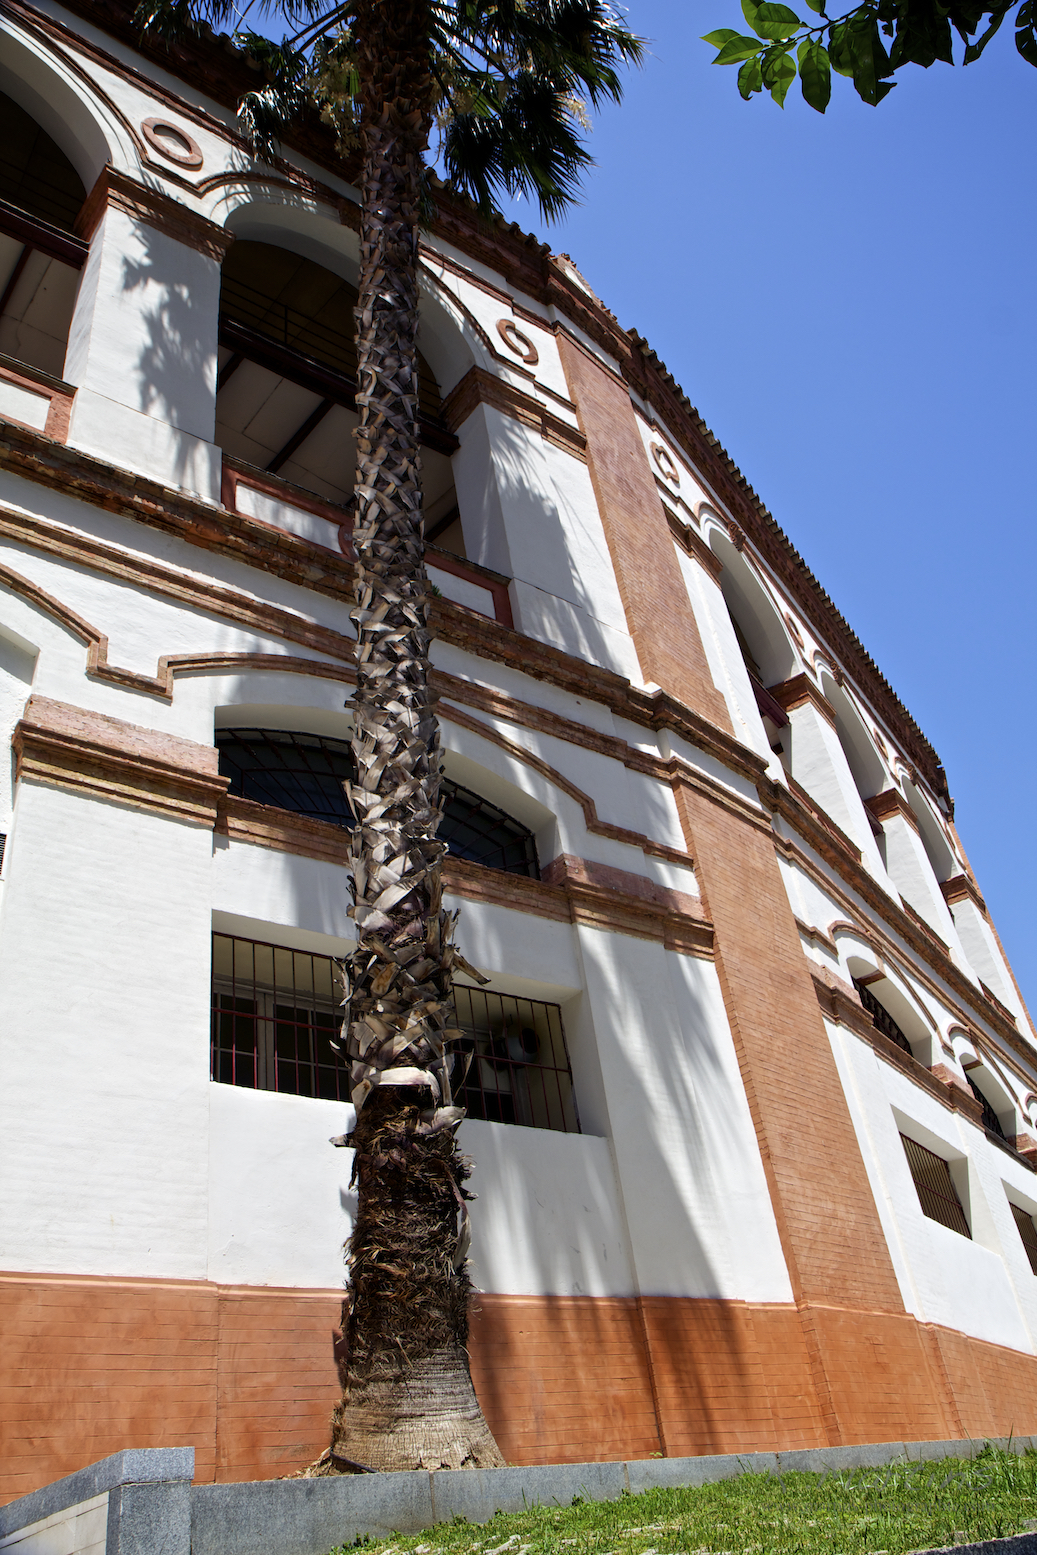 malaga (9).jpg